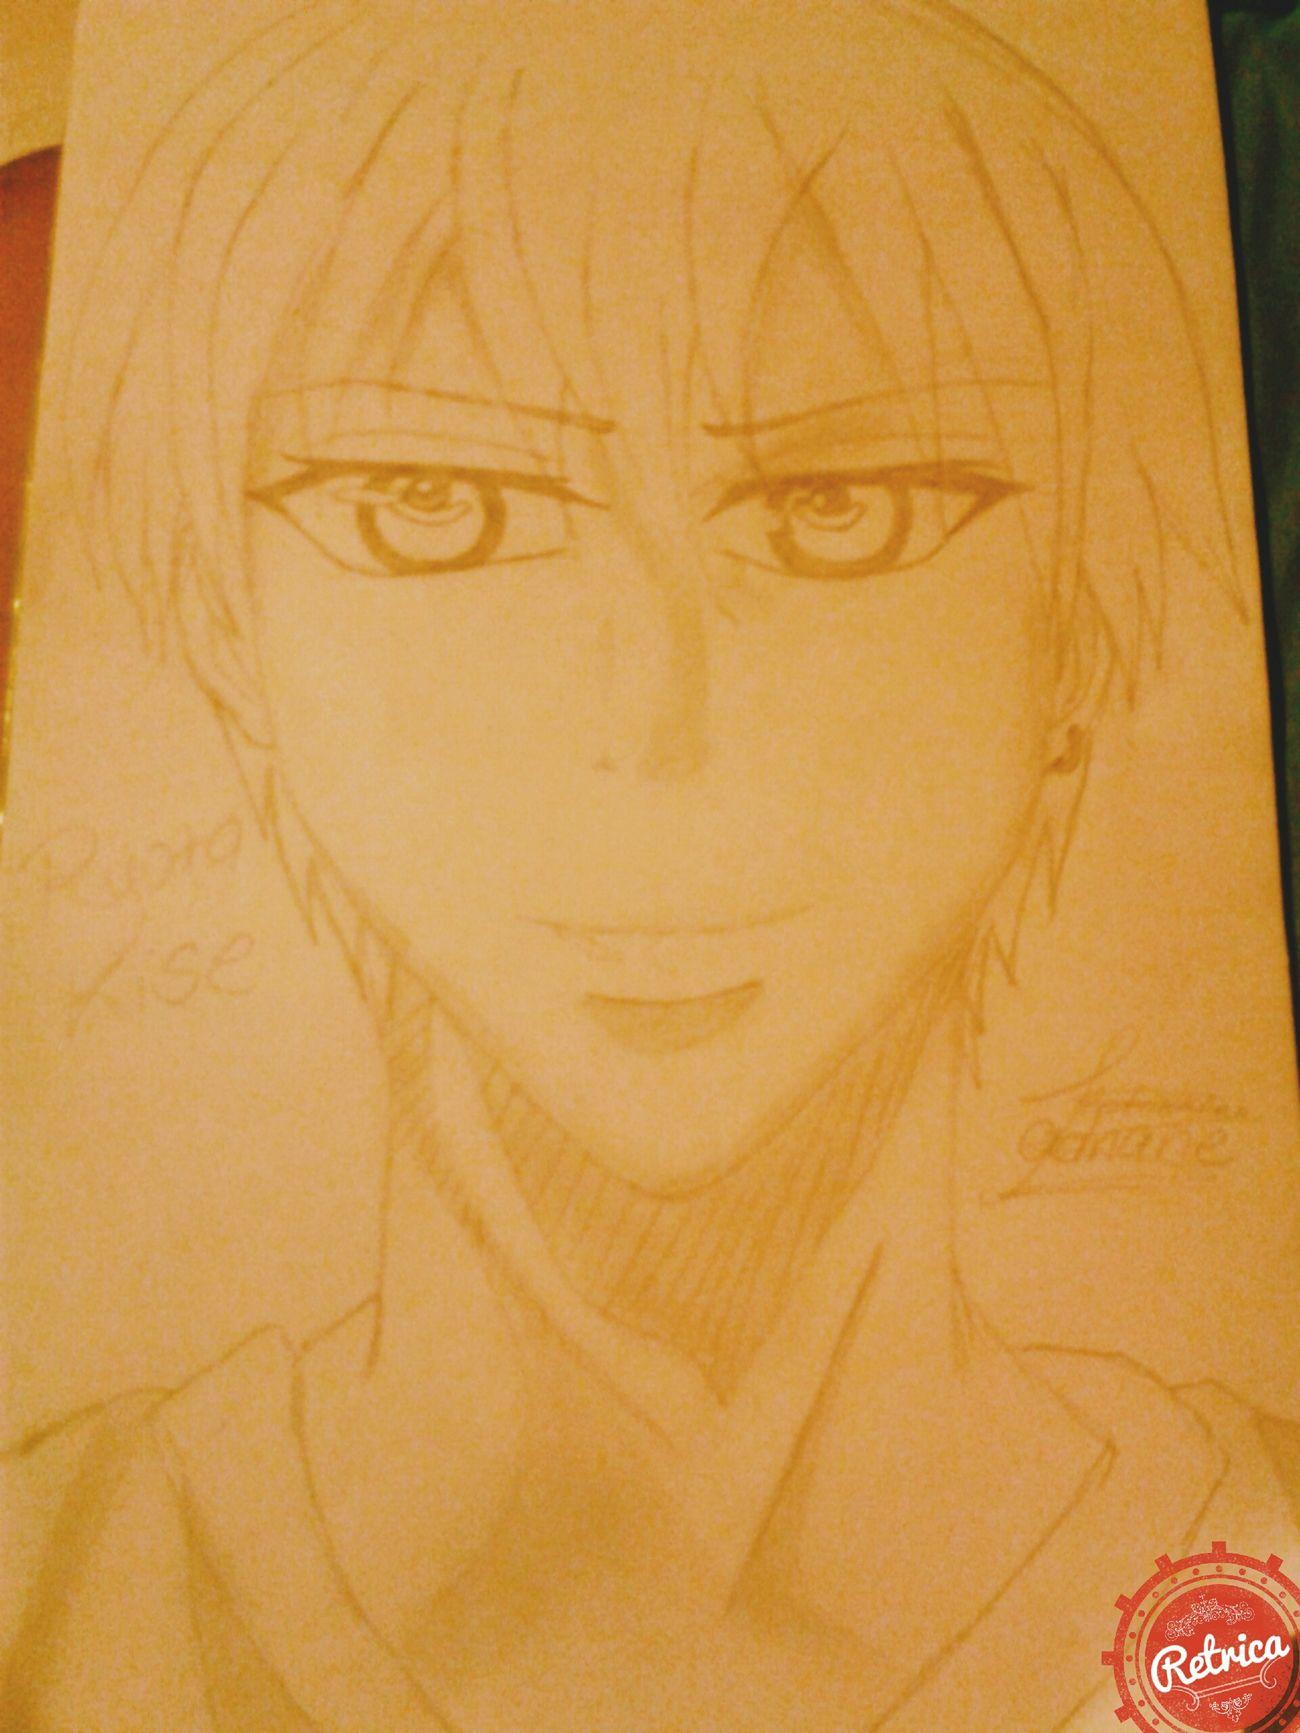 Kuroko No Basket Ryota Kise Kun My Draw ♥